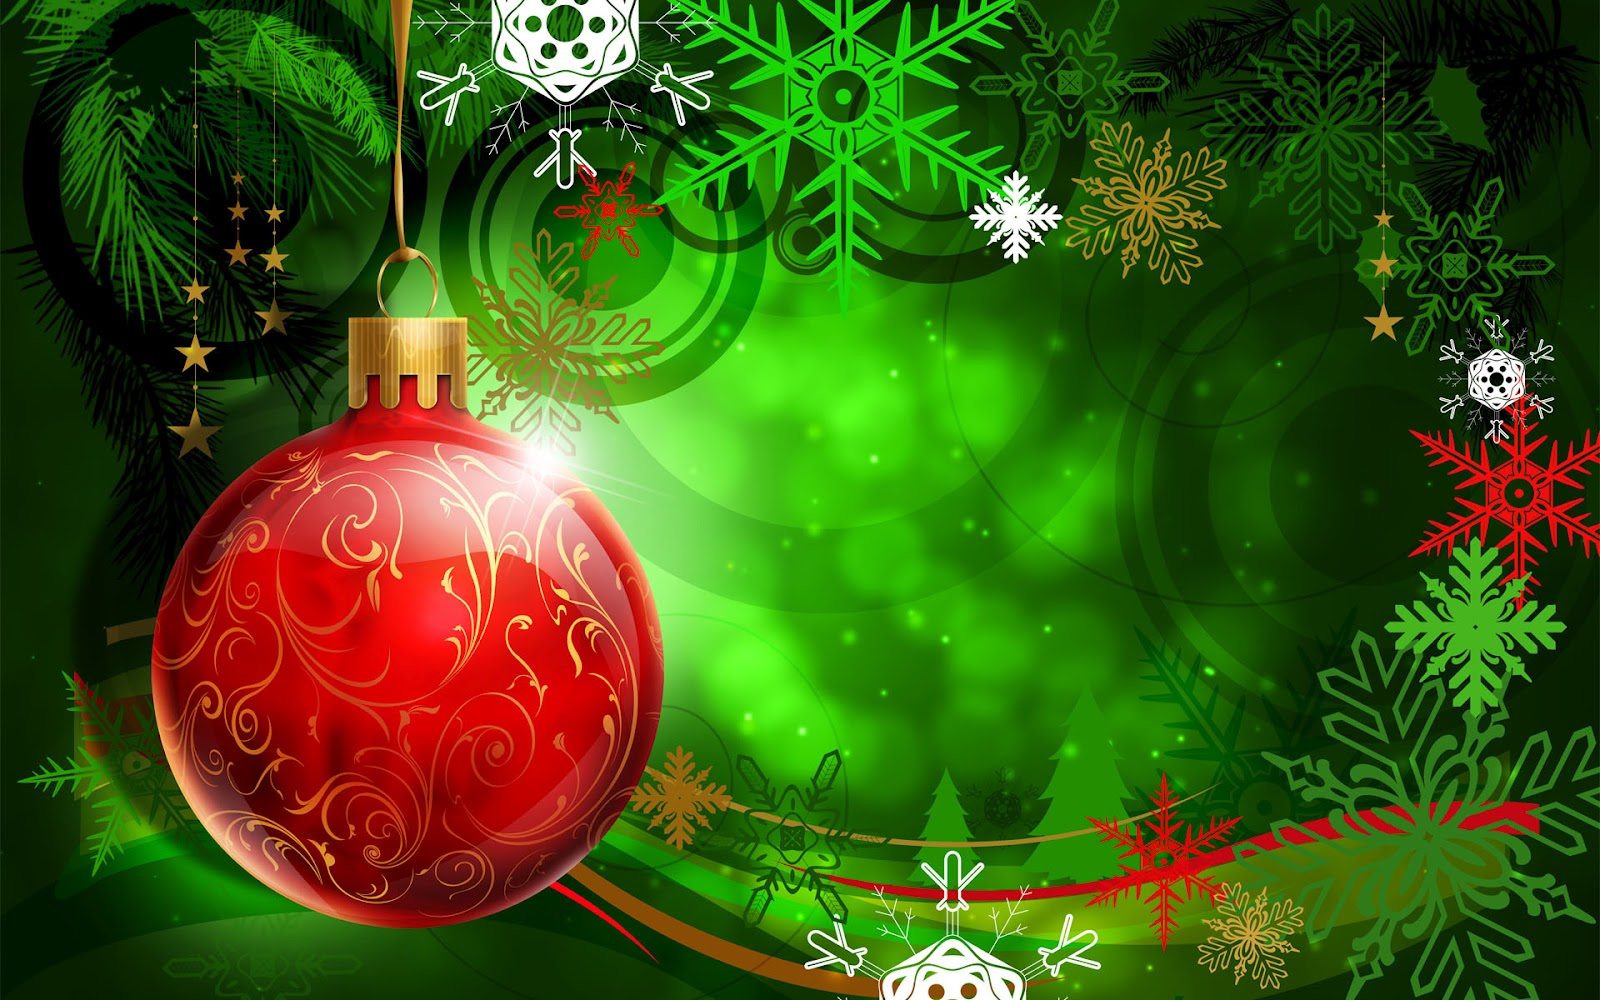 Christmas Background Wallpaper - WallpaperSafari